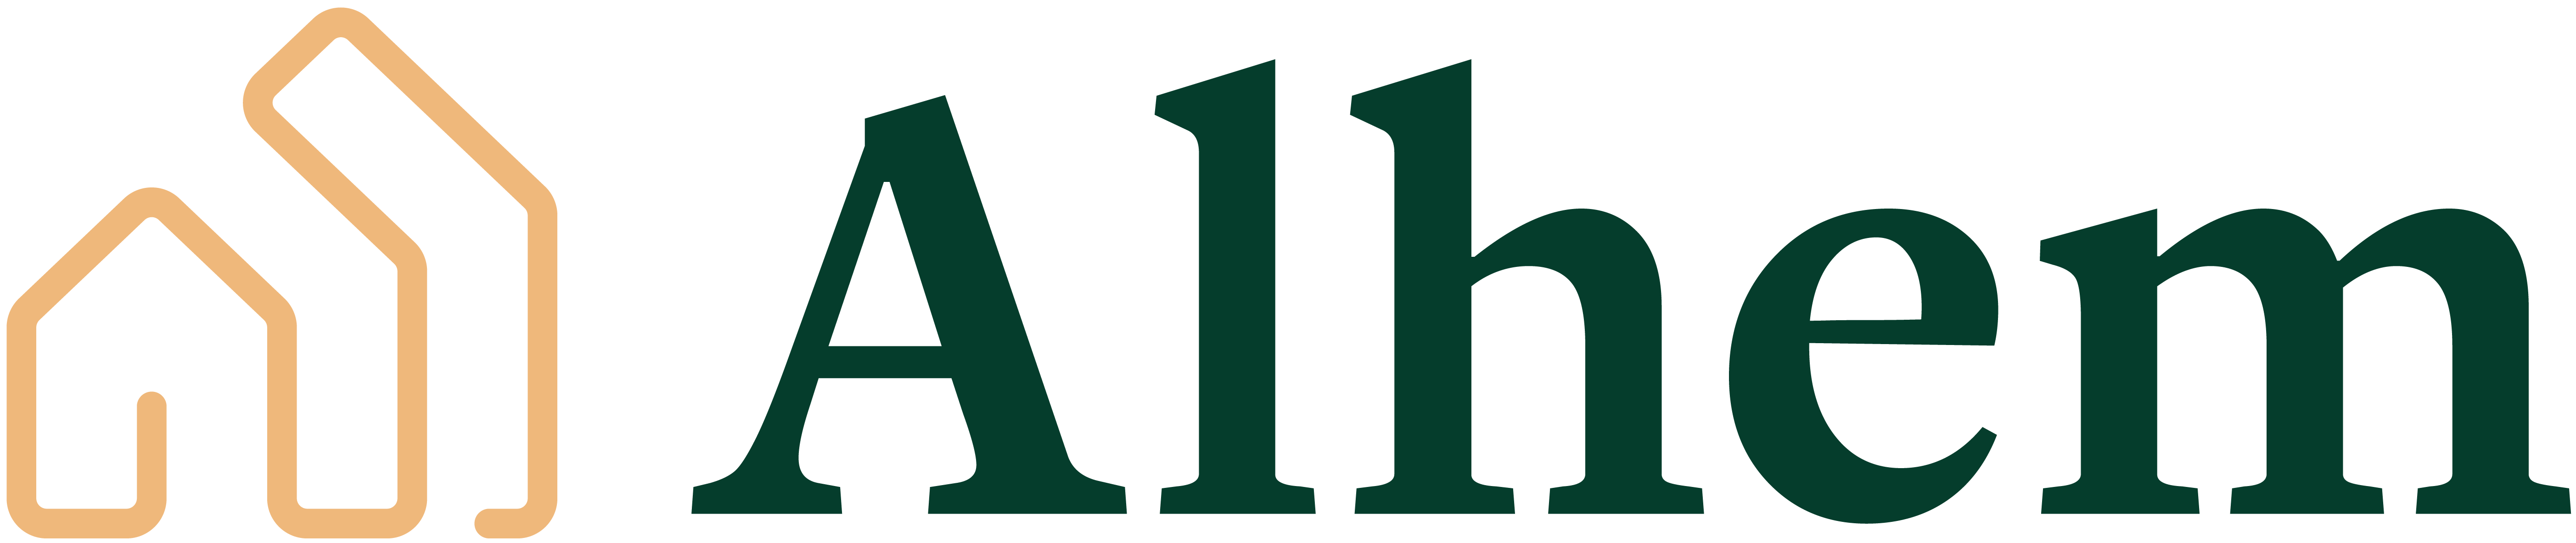 Alhemfast